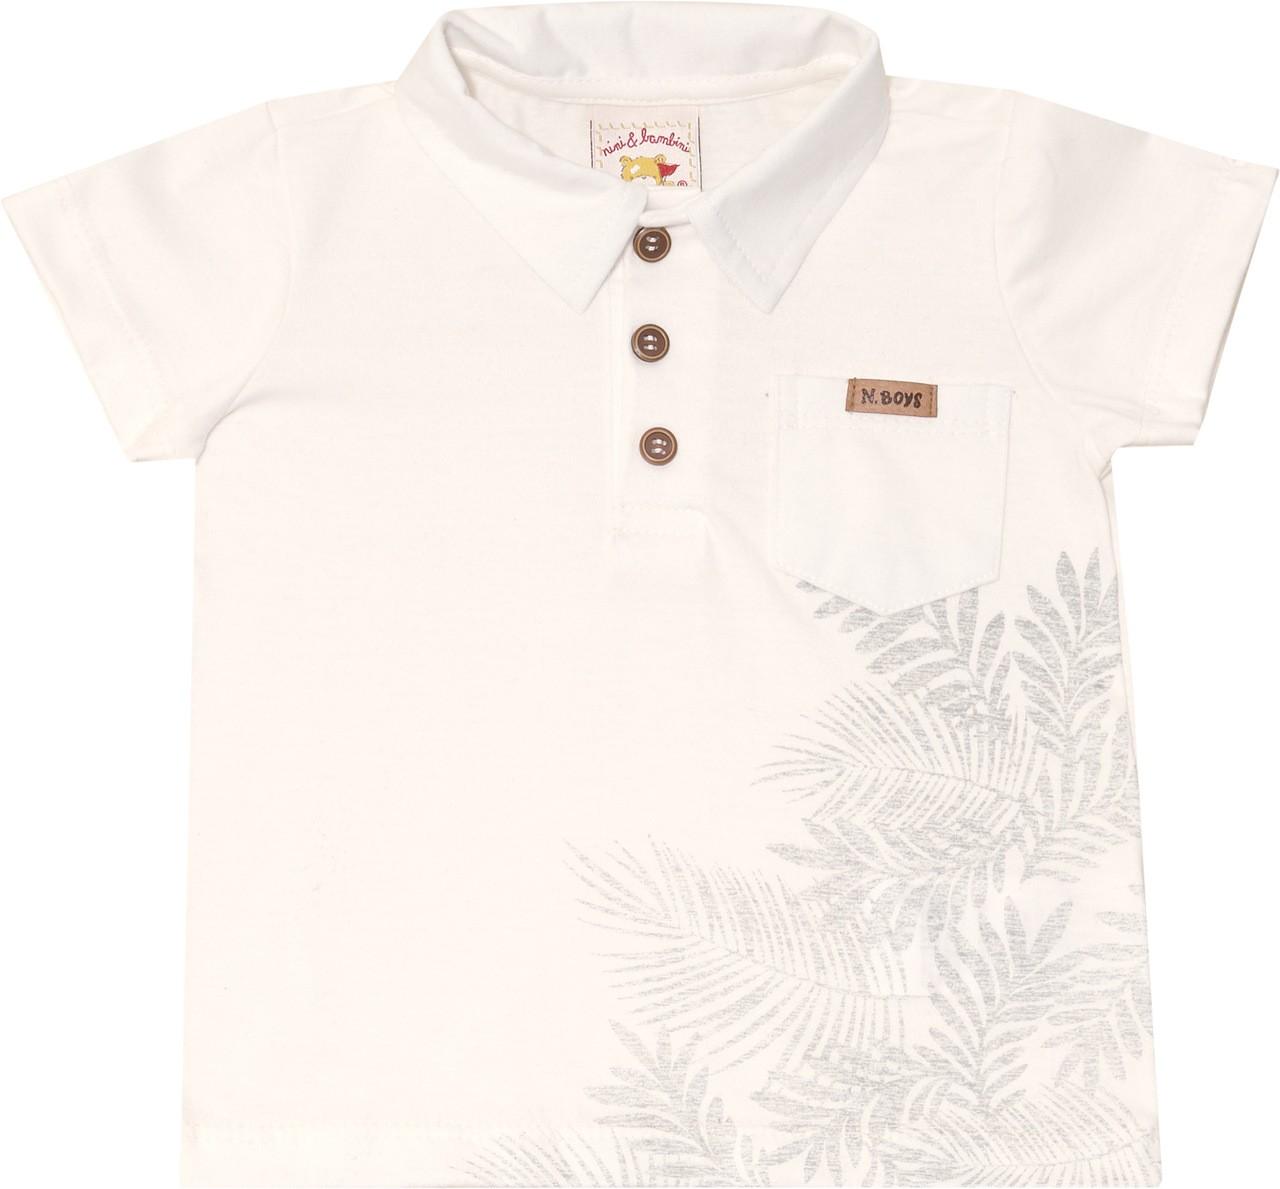 Conjunto Camiseta Polo Nini & Bambini